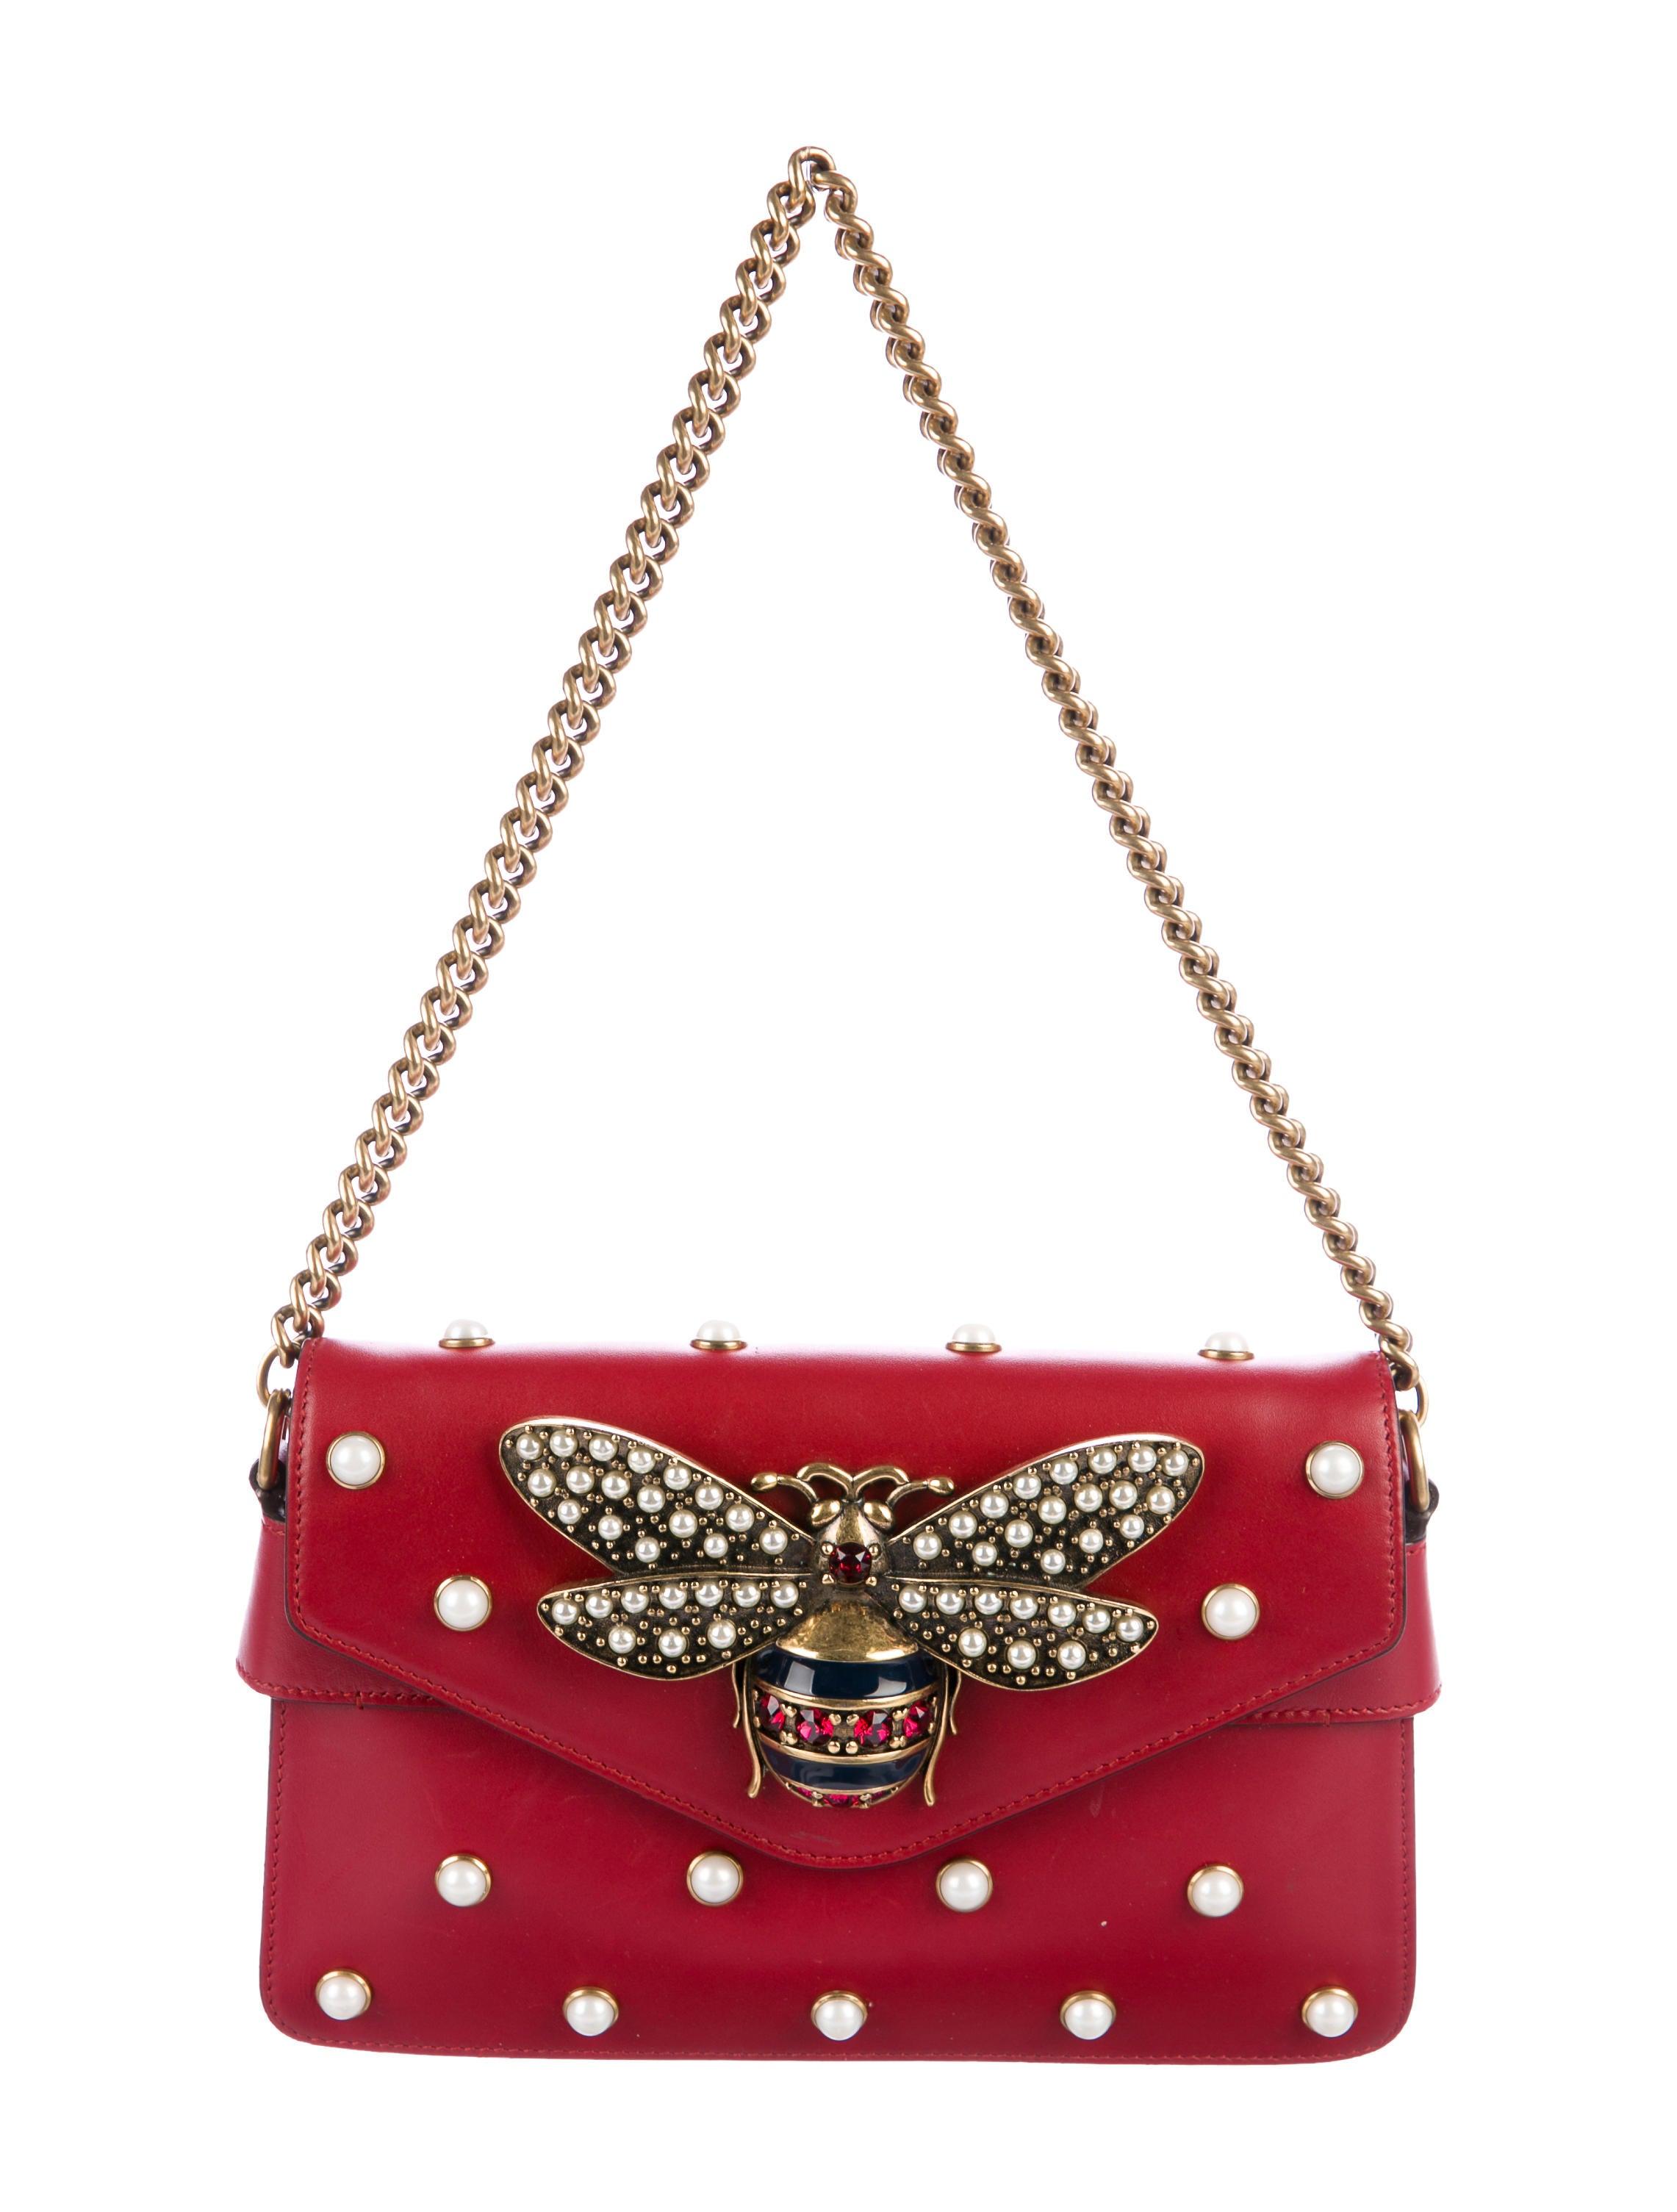 9e2b8b84bd0 Gucci 2017 Broadway Mini Bag - Handbags - GUC186400